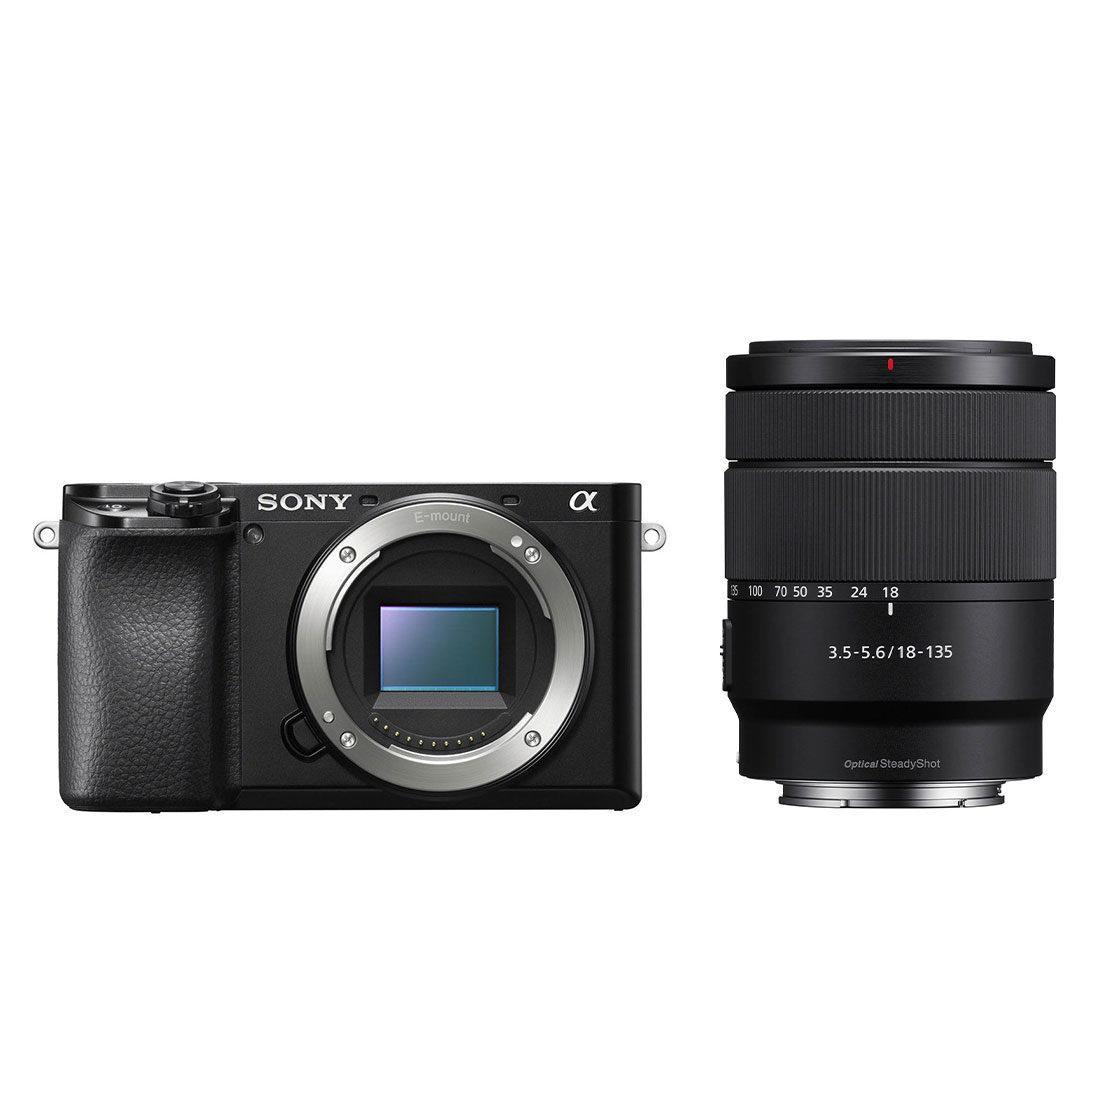 Sony Alpha A6100 systeemcamera Zwart + 18-135mm f/3.5-6.3 <br/>€ 1169.00 <br/> <a href='https://www.cameranu.nl/fotografie/?tt=12190_474631_241358_&r=https%3A%2F%2Fwww.cameranu.nl%2Fnl%2Fp3194862%2Fsony-alpha-a6100-systeemcamera-zwart-18-135mm-f-3-5-6-3%3Fchannable%3D002a5969640033313934383632b7%26utm_campaign%3D%26utm_content%3DSony%2Bsysteemcamera%26utm_source%3DTradetracker%26utm_medium%3Dcpc%26utm_term%3DDigitale%2Bcamera%26apos%3Bs' target='_blank'>naar de winkel</a>